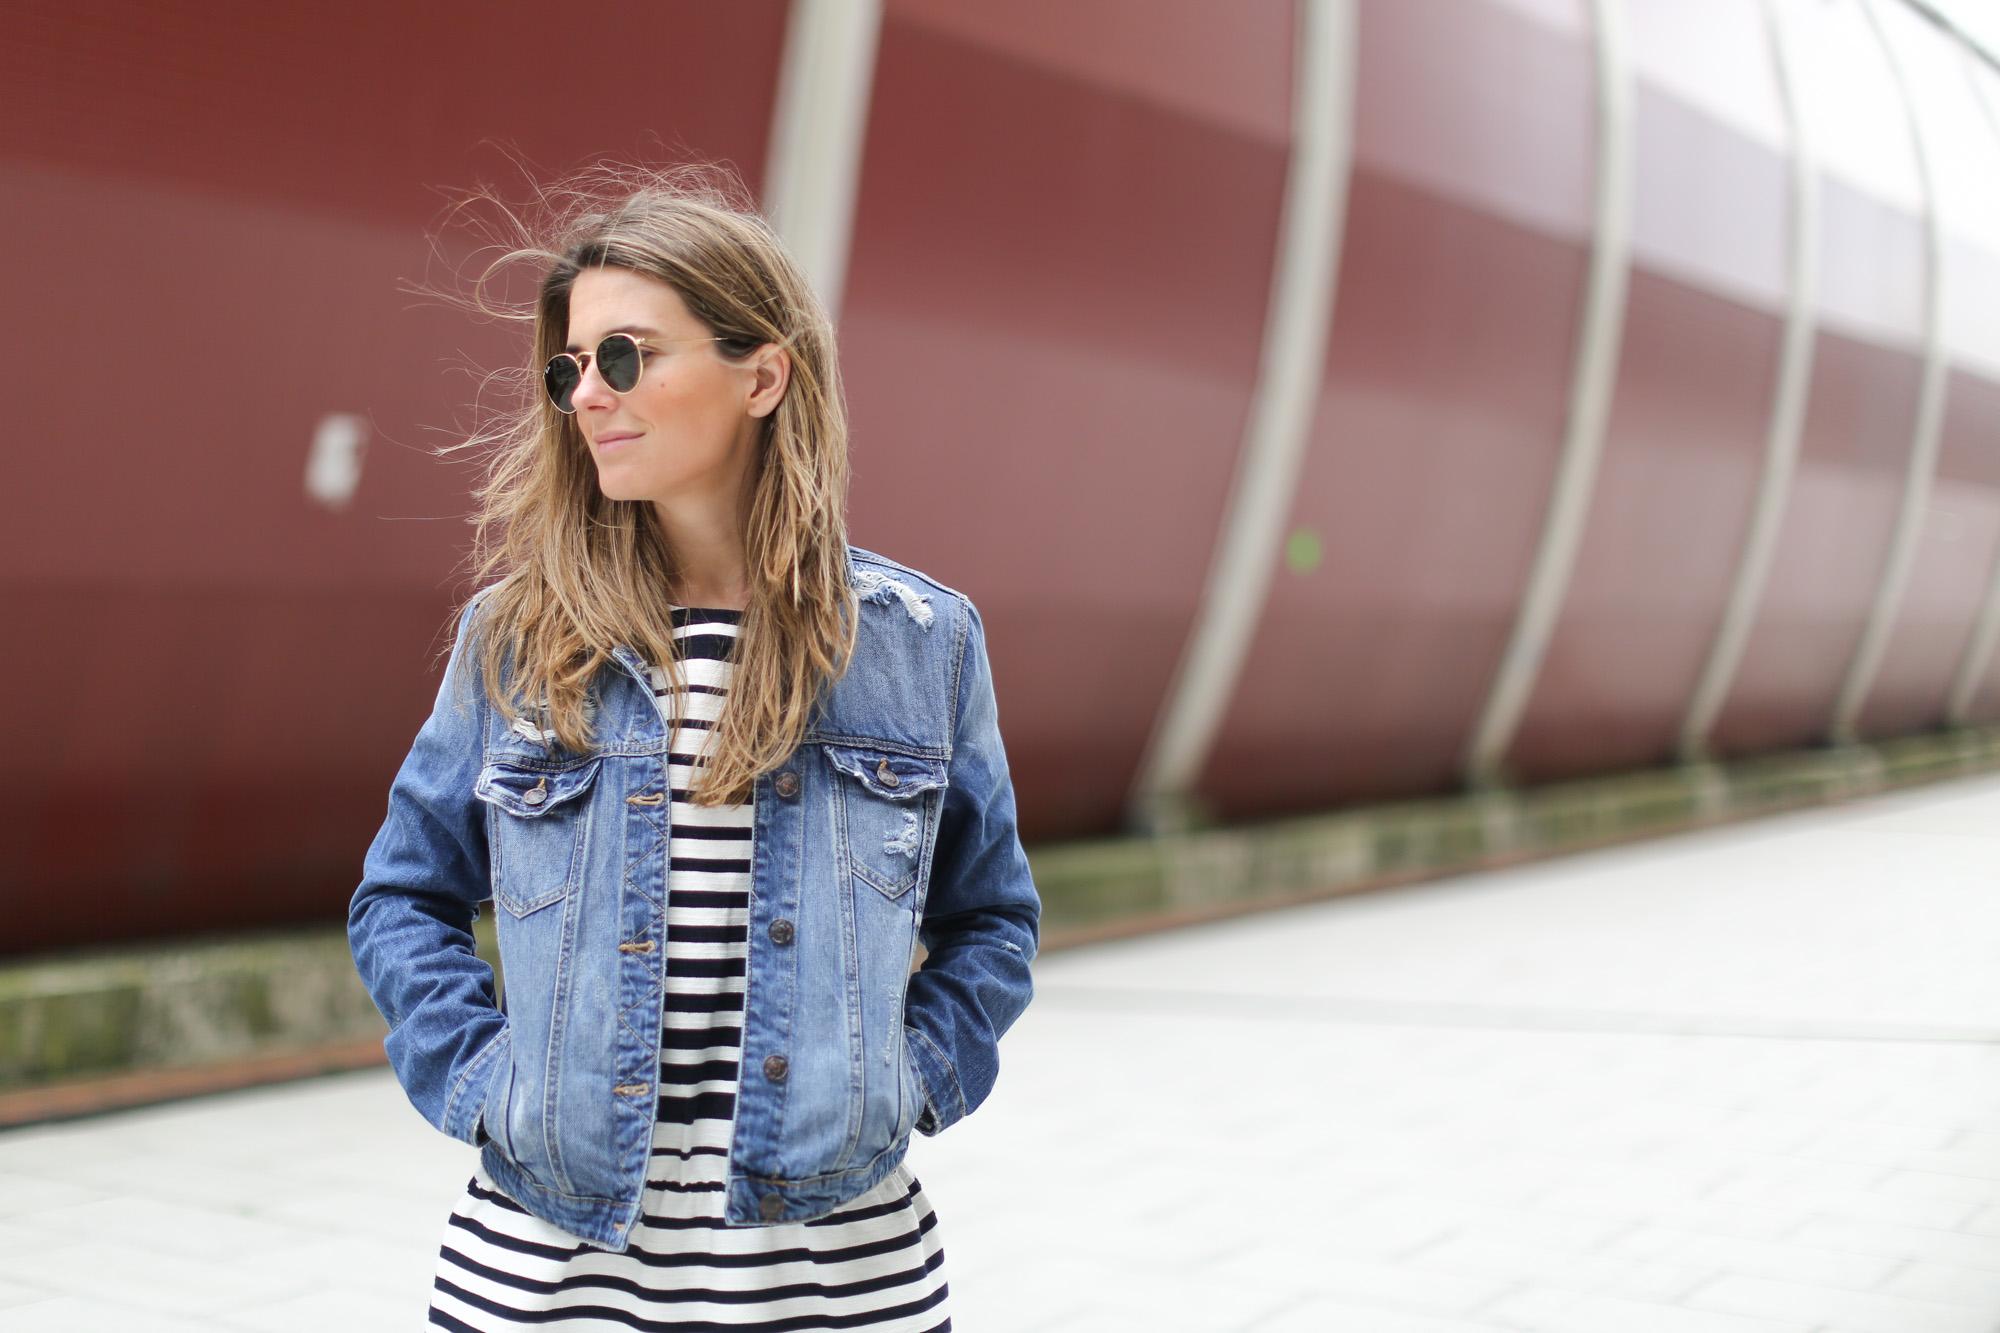 Clochet-streetstyle-suiteblanco-denim-jacket-stripped-dress-superga-classic-navy